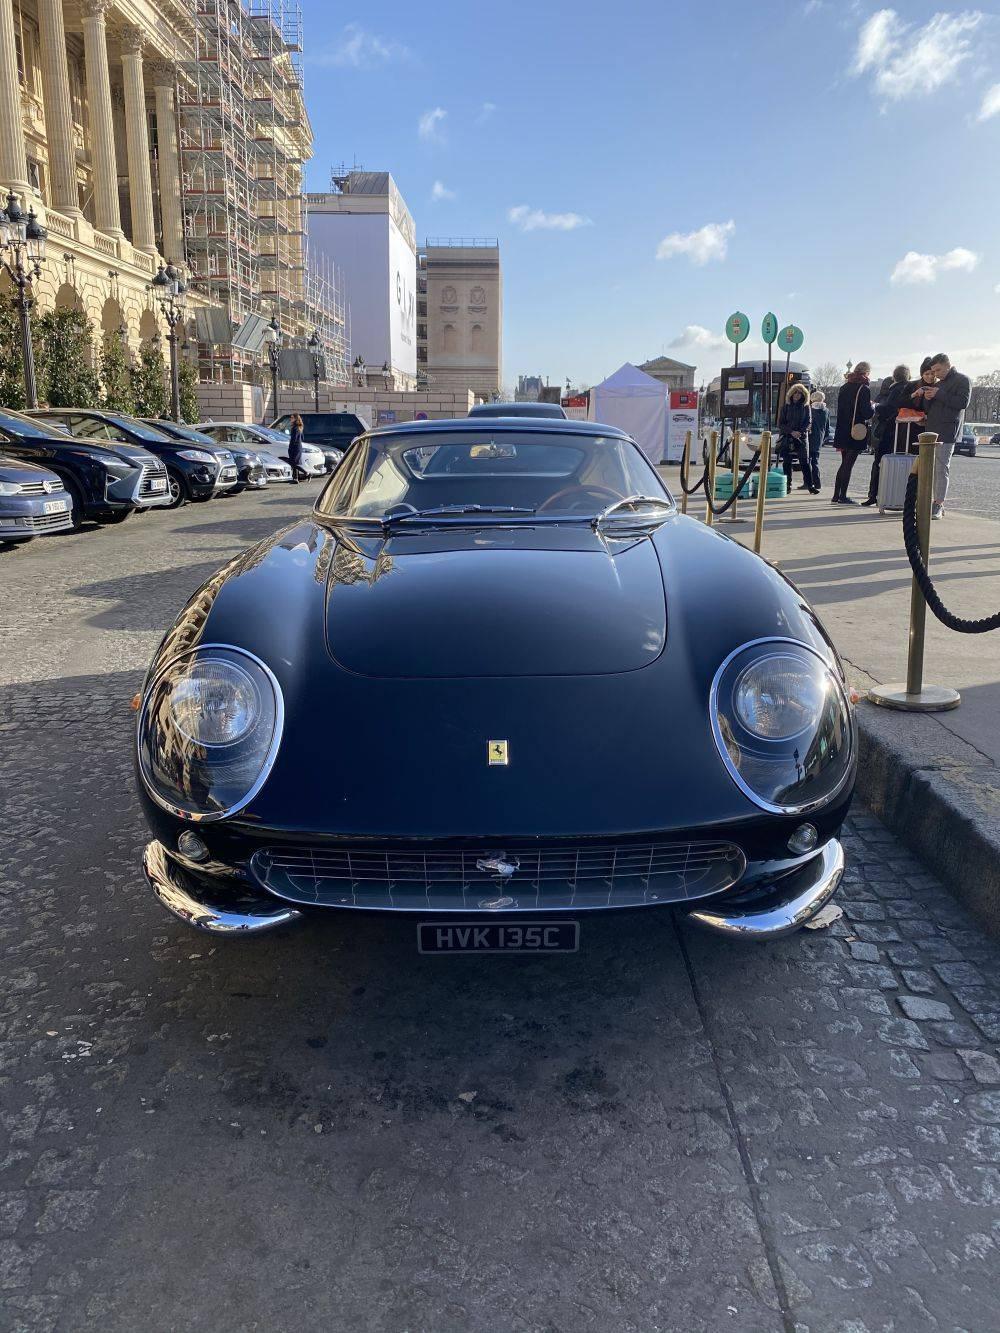 Vintage Ferrari on the streets of Paris